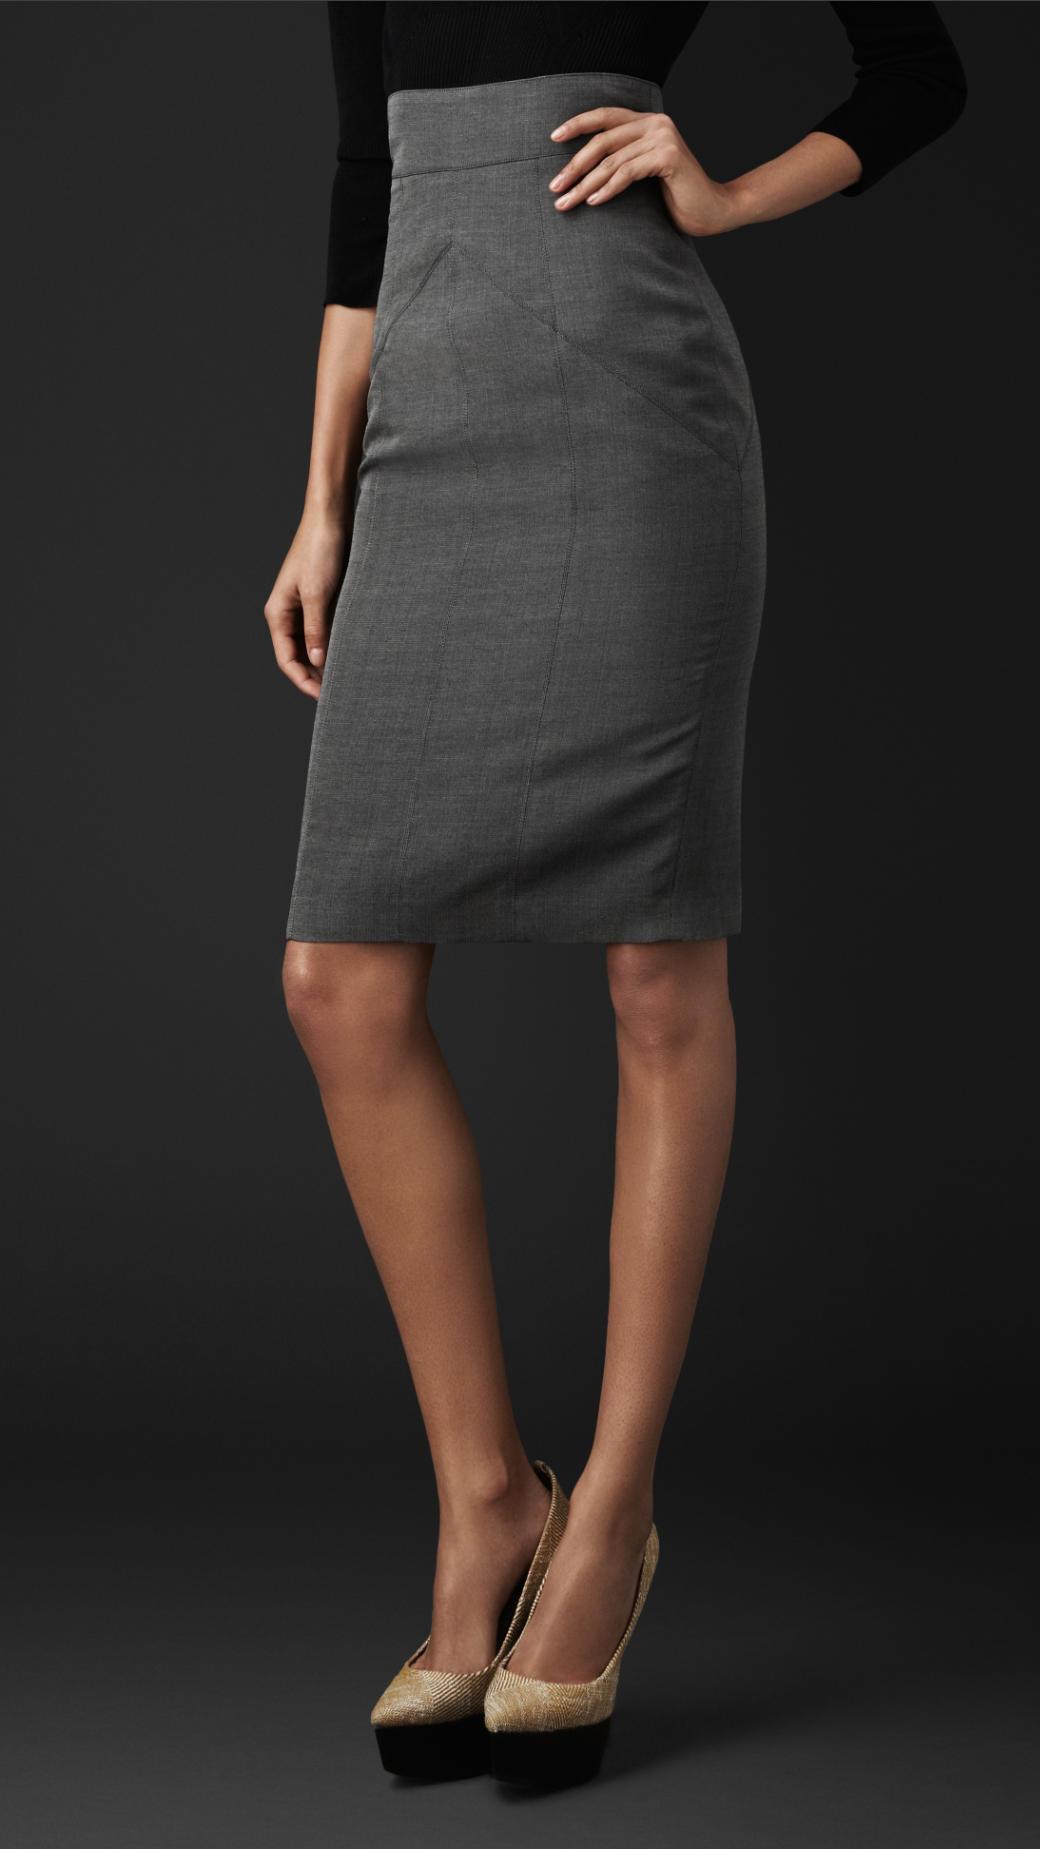 Burberry Cotton Silk Pencil Skirt In Mid Grey Melange